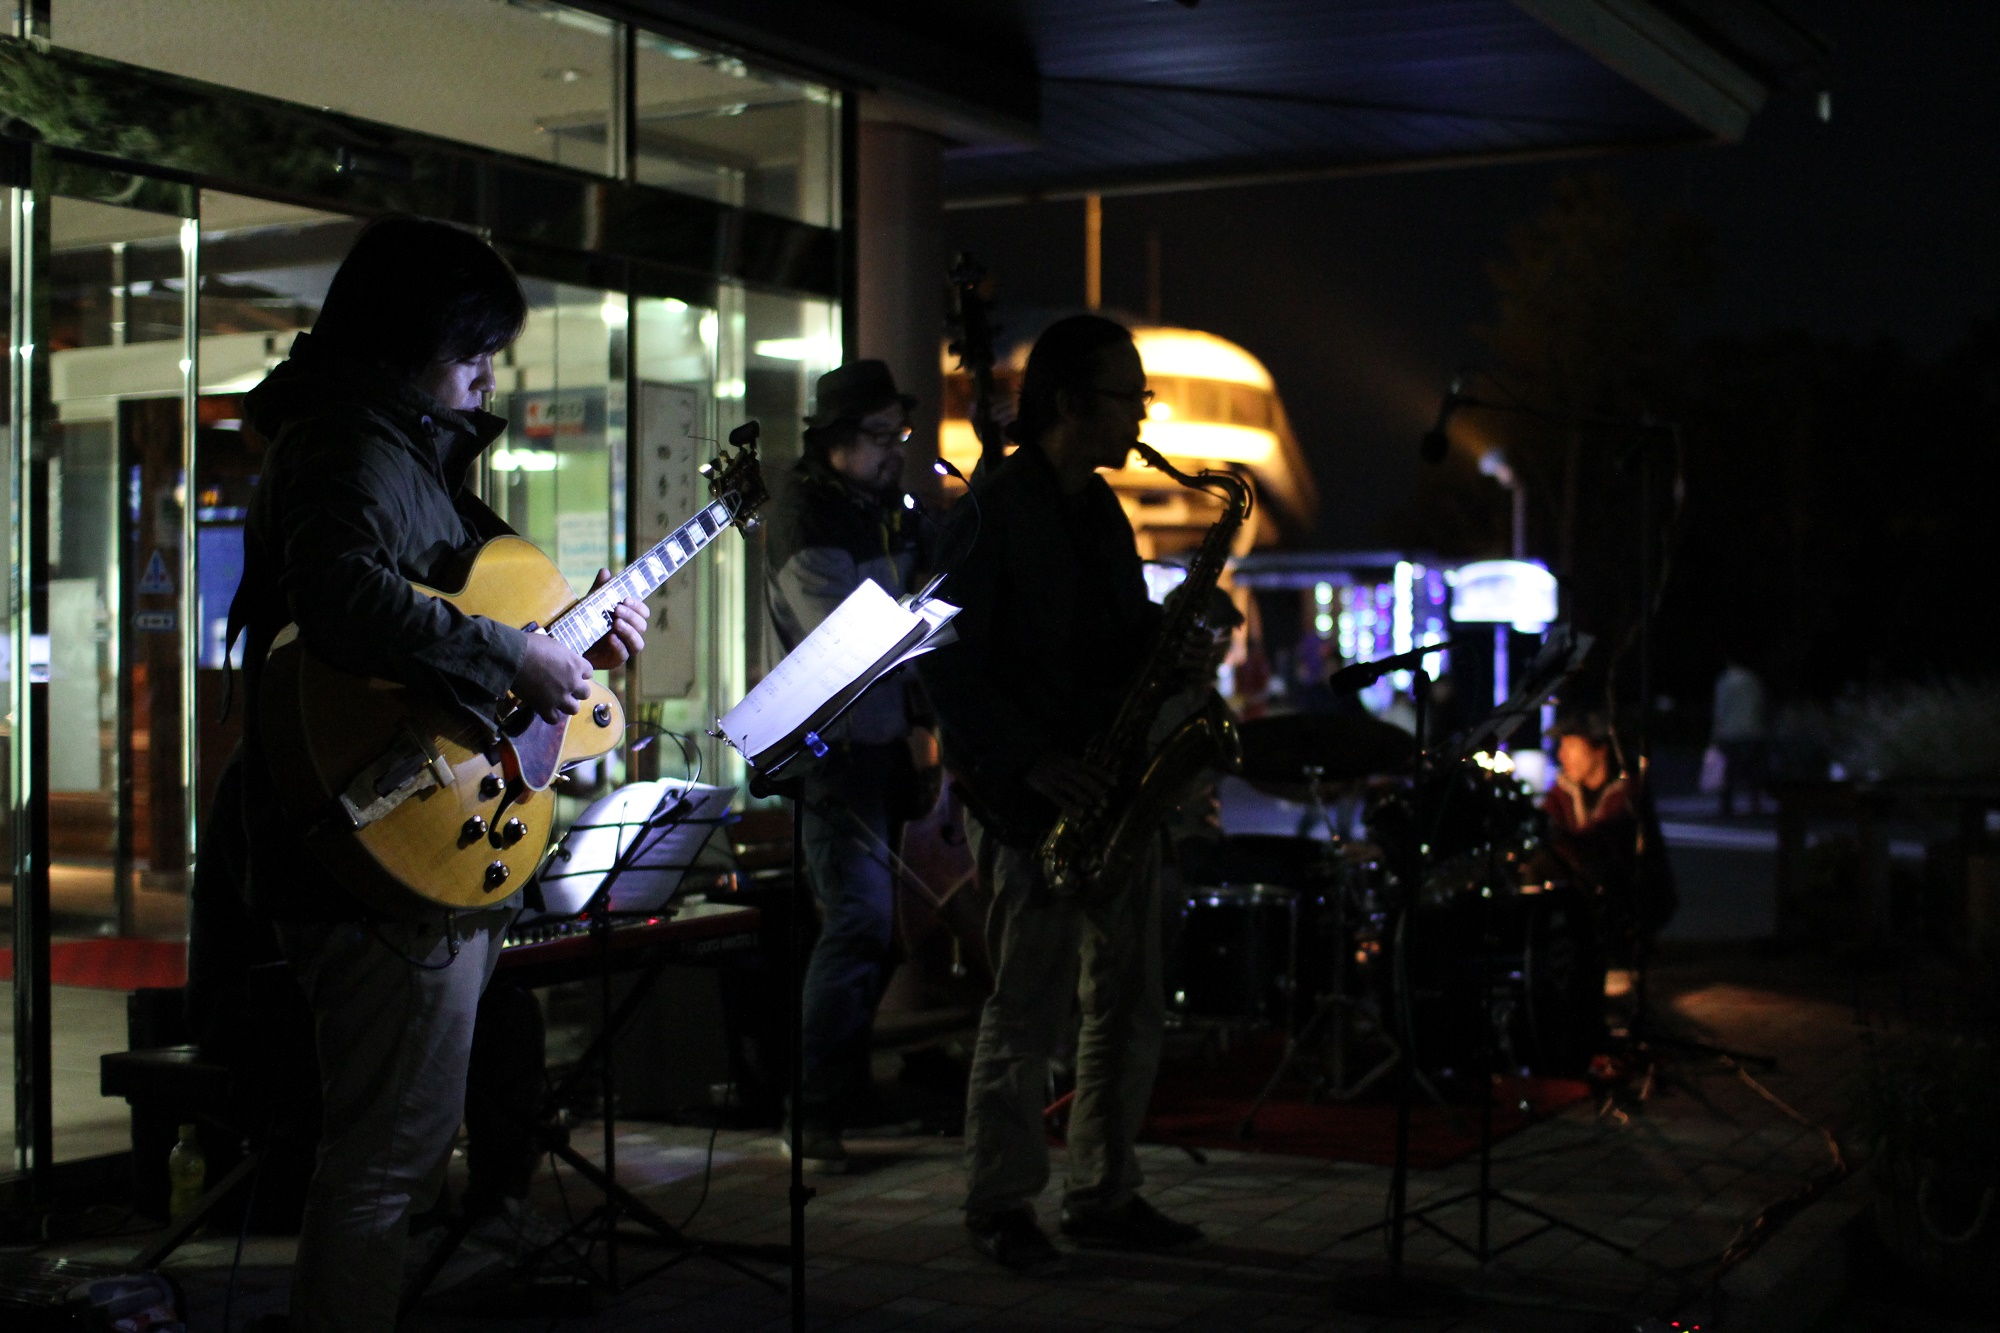 Jazzイベント 【MusicNightOrpheus】開催 天空の楽園 日本一の星空ツアー | スタービレッジ阿智